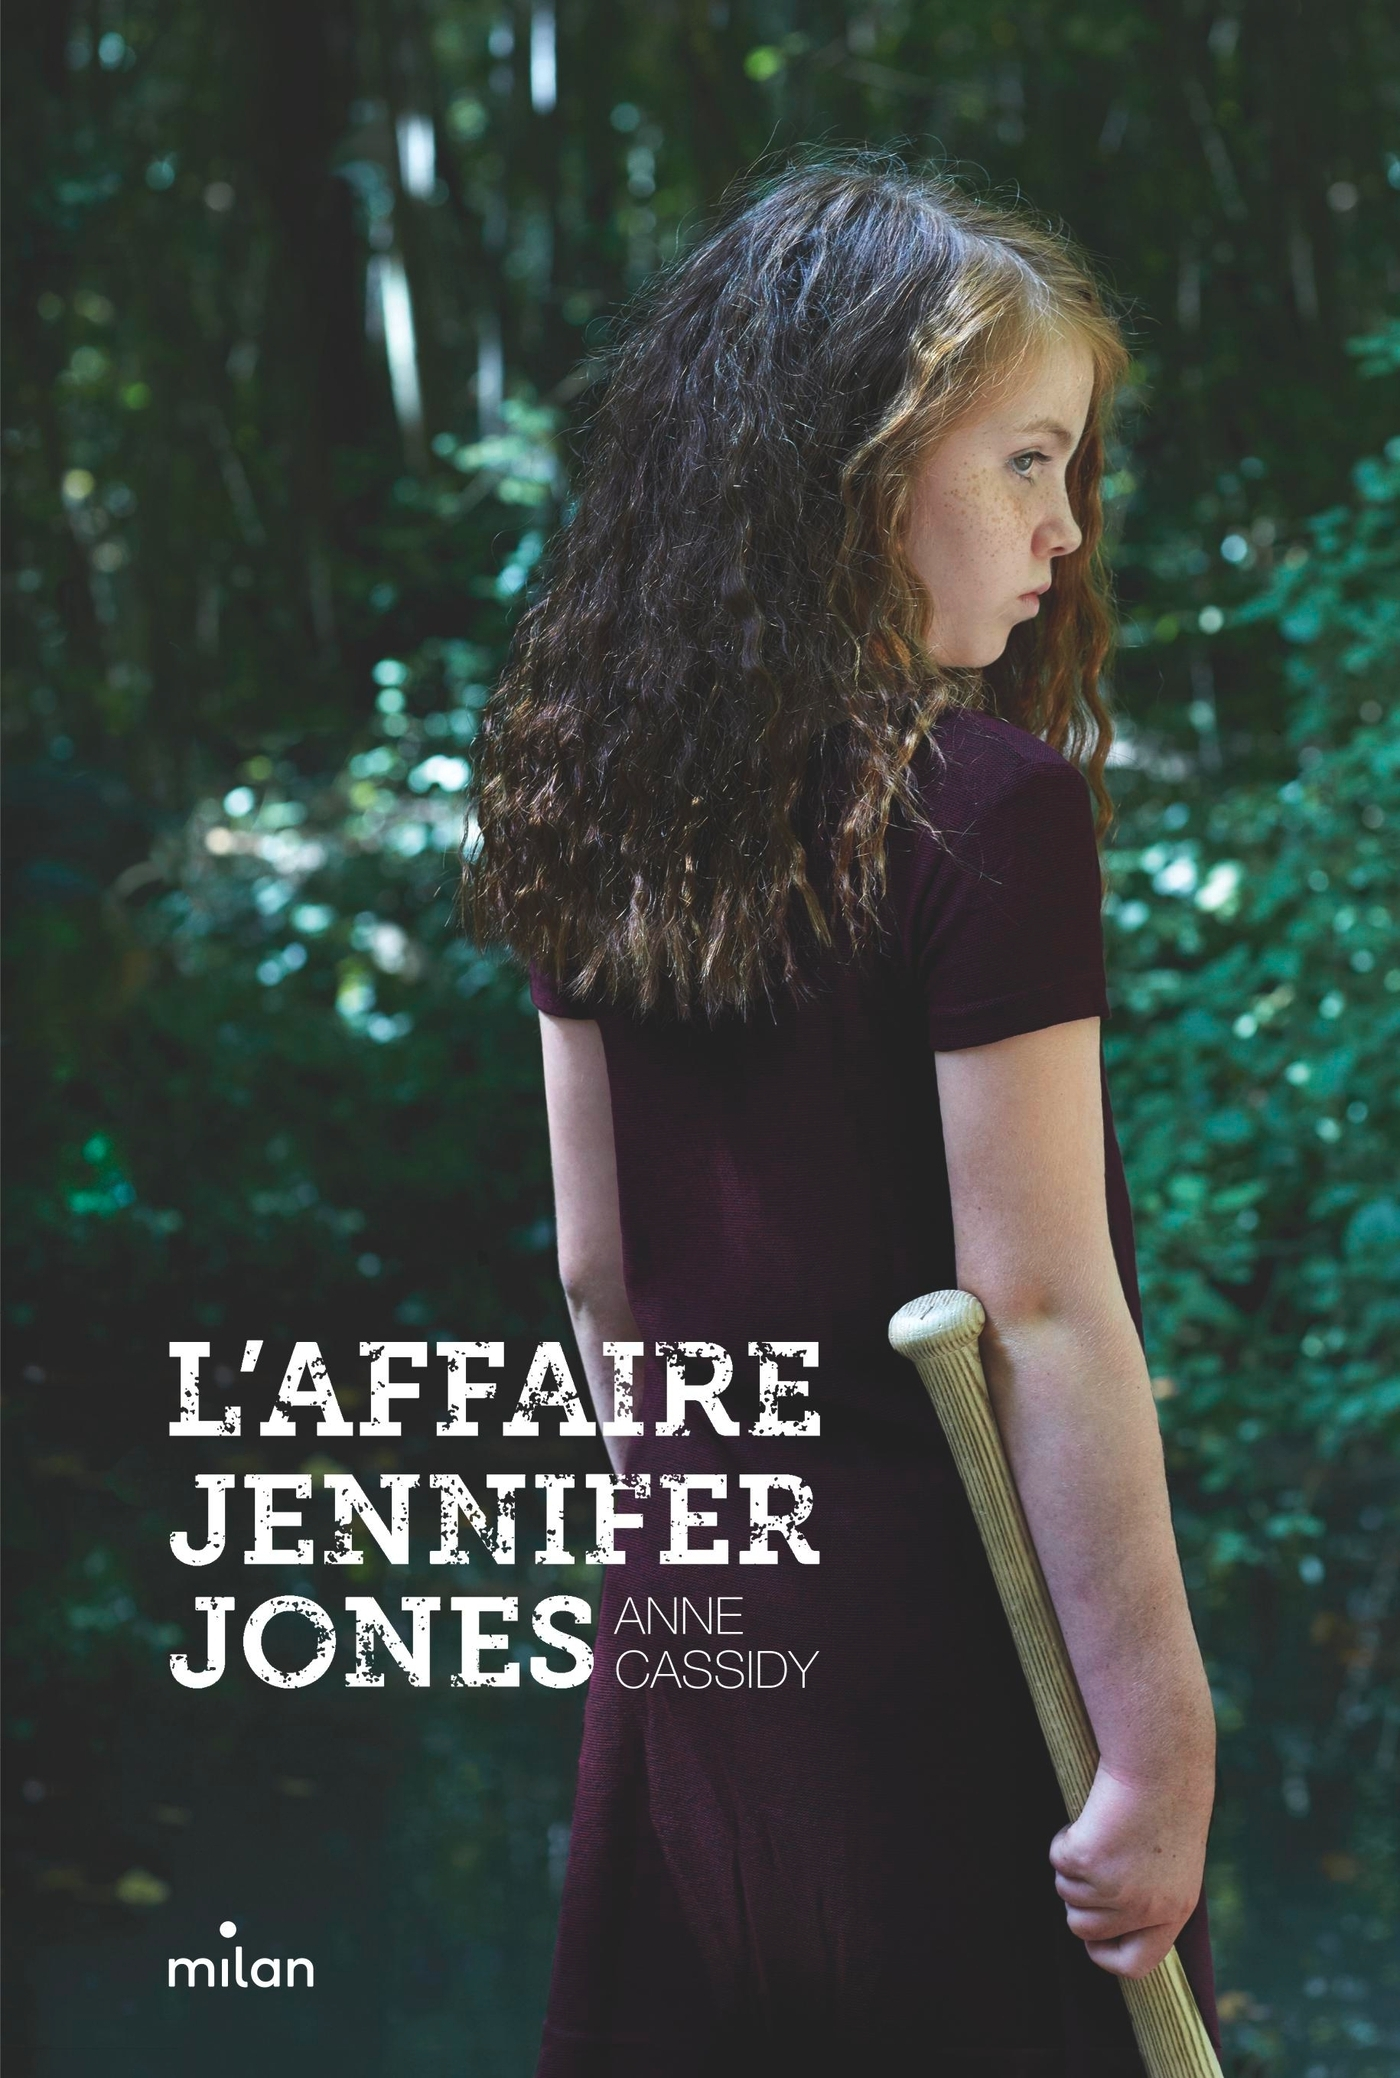 L'AFFAIRE JENIFER JONES